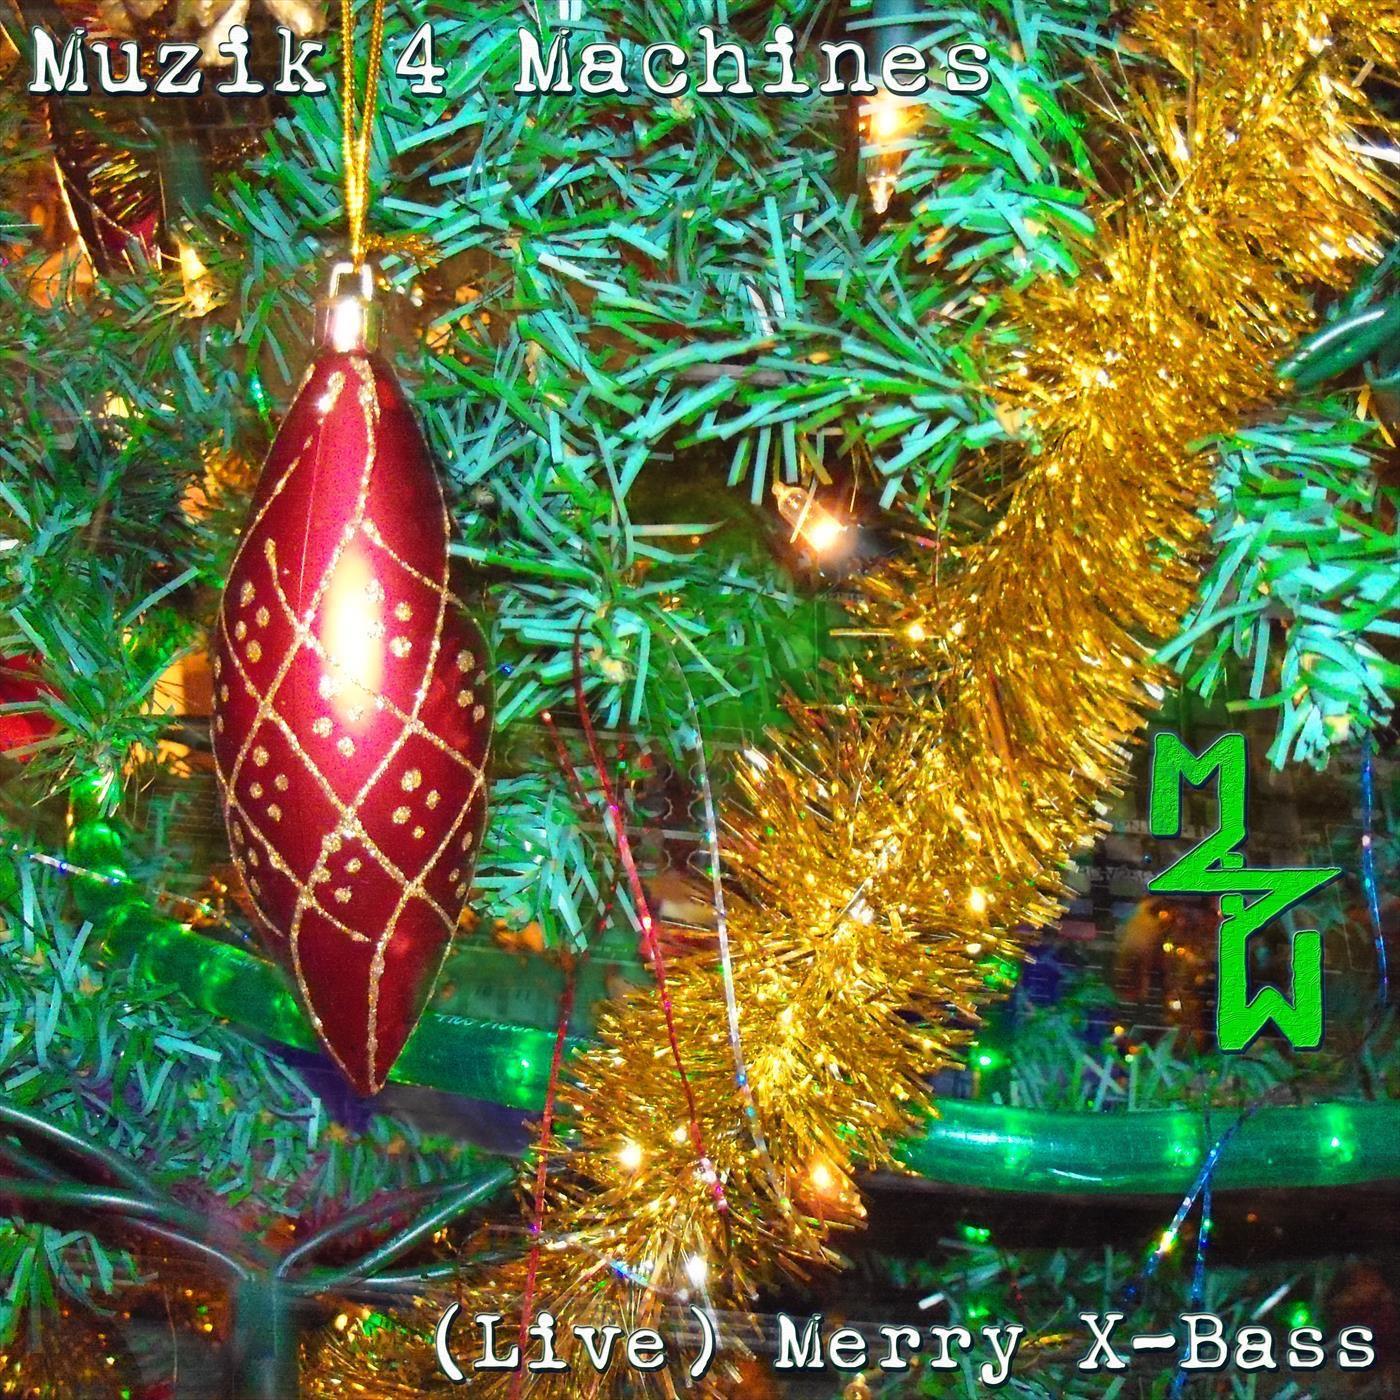 Merry X-Bass (Live) - EP